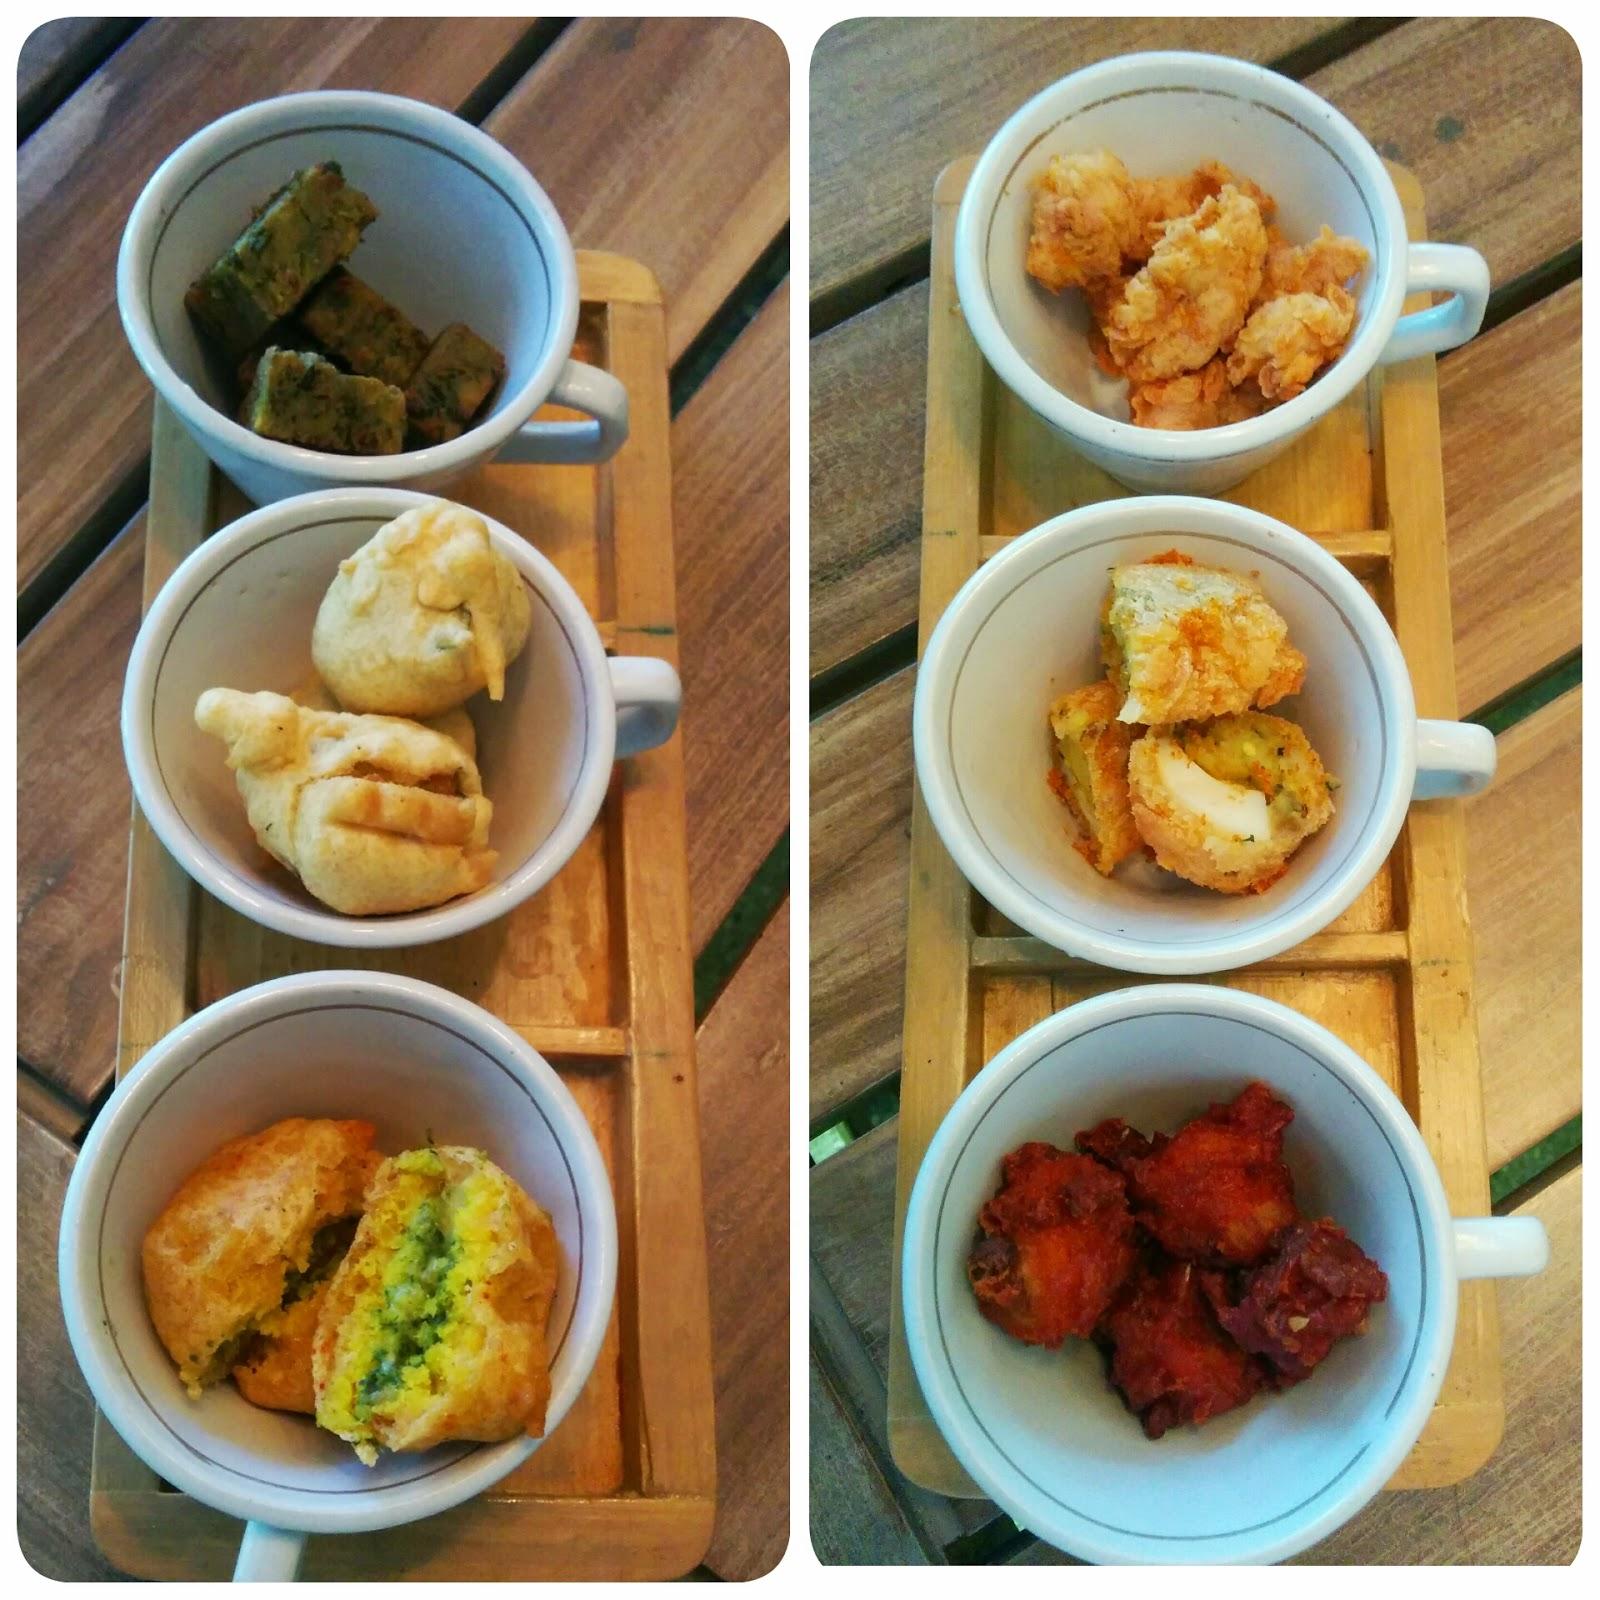 Bombay Chowpatty Buffet @ Bronx | The Pune Dining Room